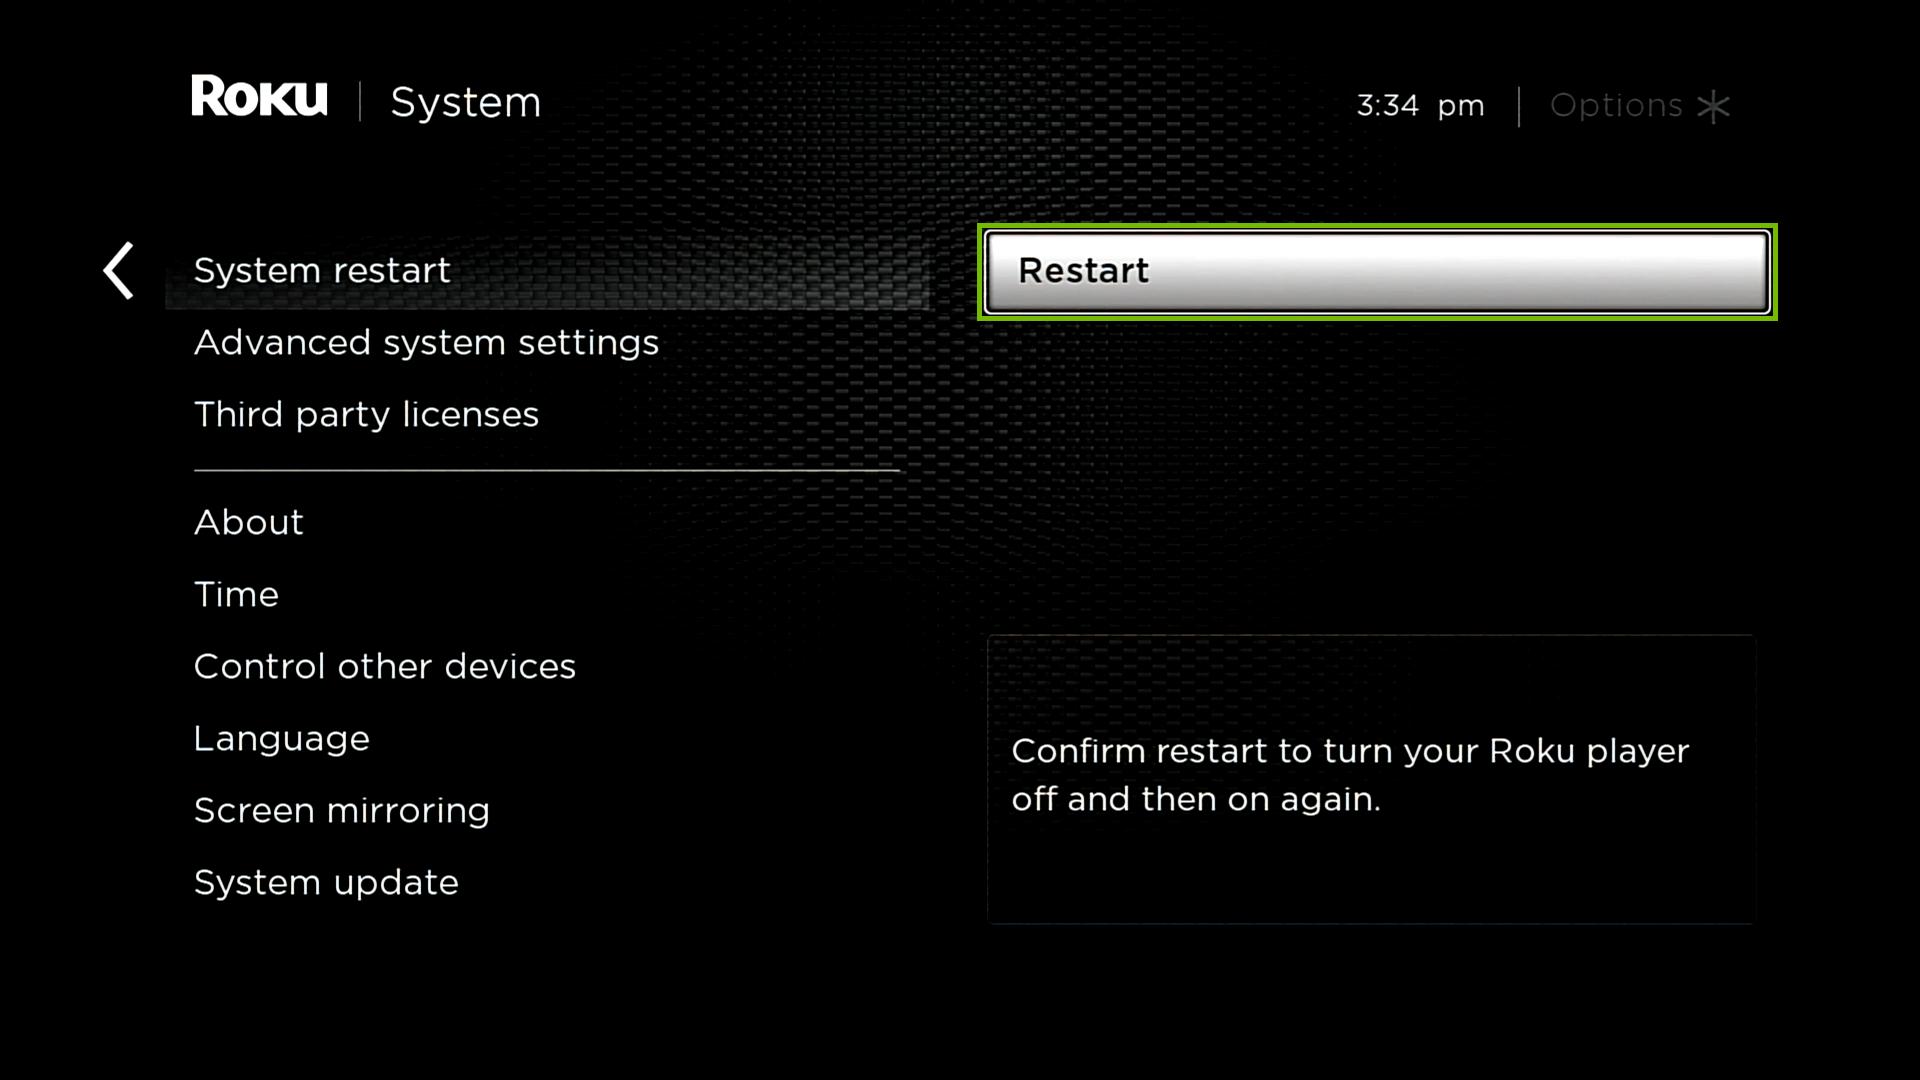 System restart with Restart highlighted.